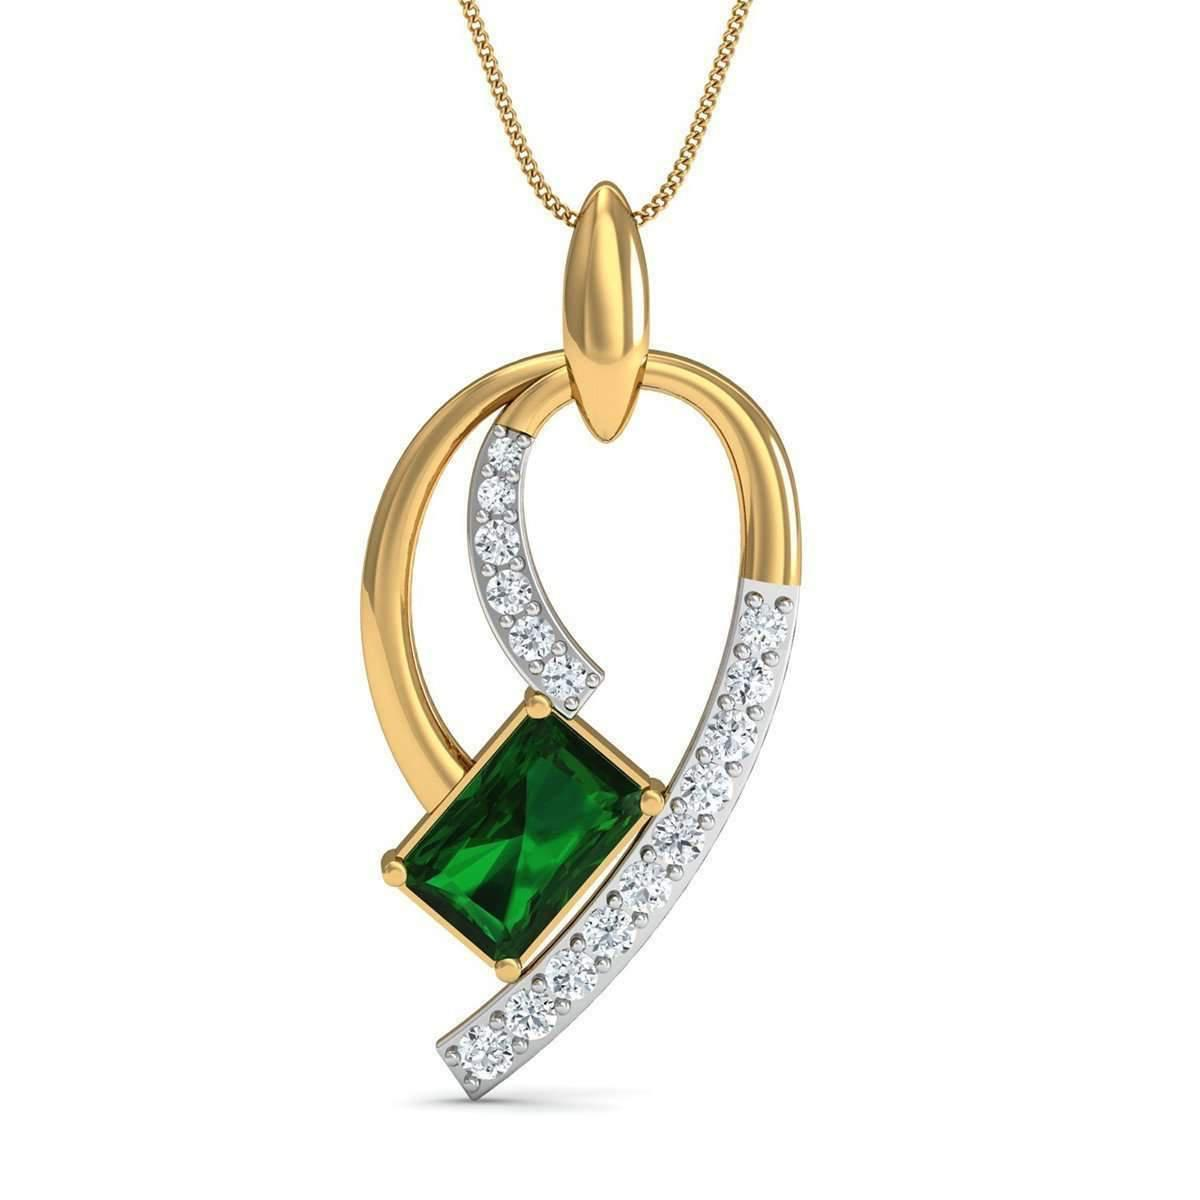 Diamoire Jewels Emerald Cut Emerald Pendant with Premium Diamonds in 18kt Yellow Gold 3B17uEHHx